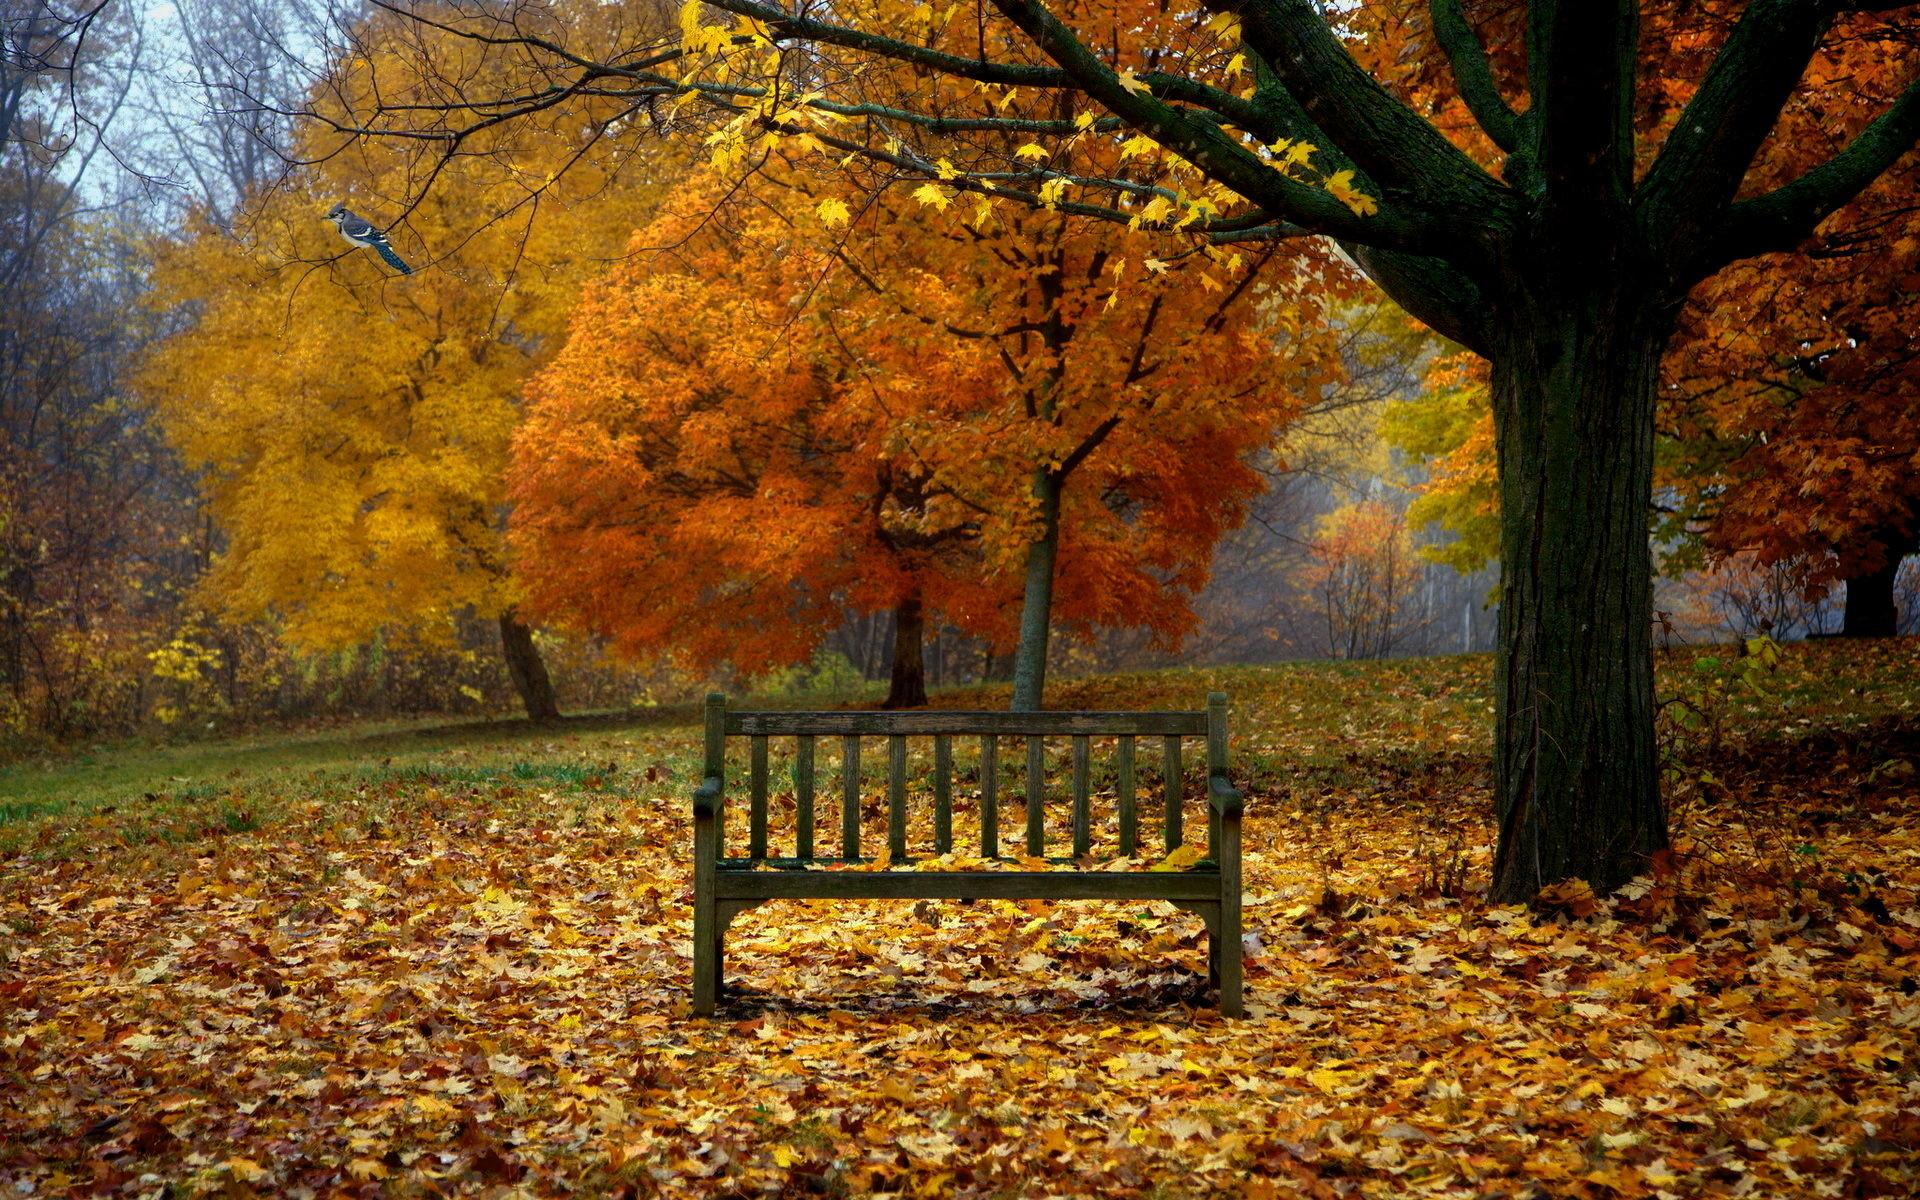 Fall Scenes For Desktop Background